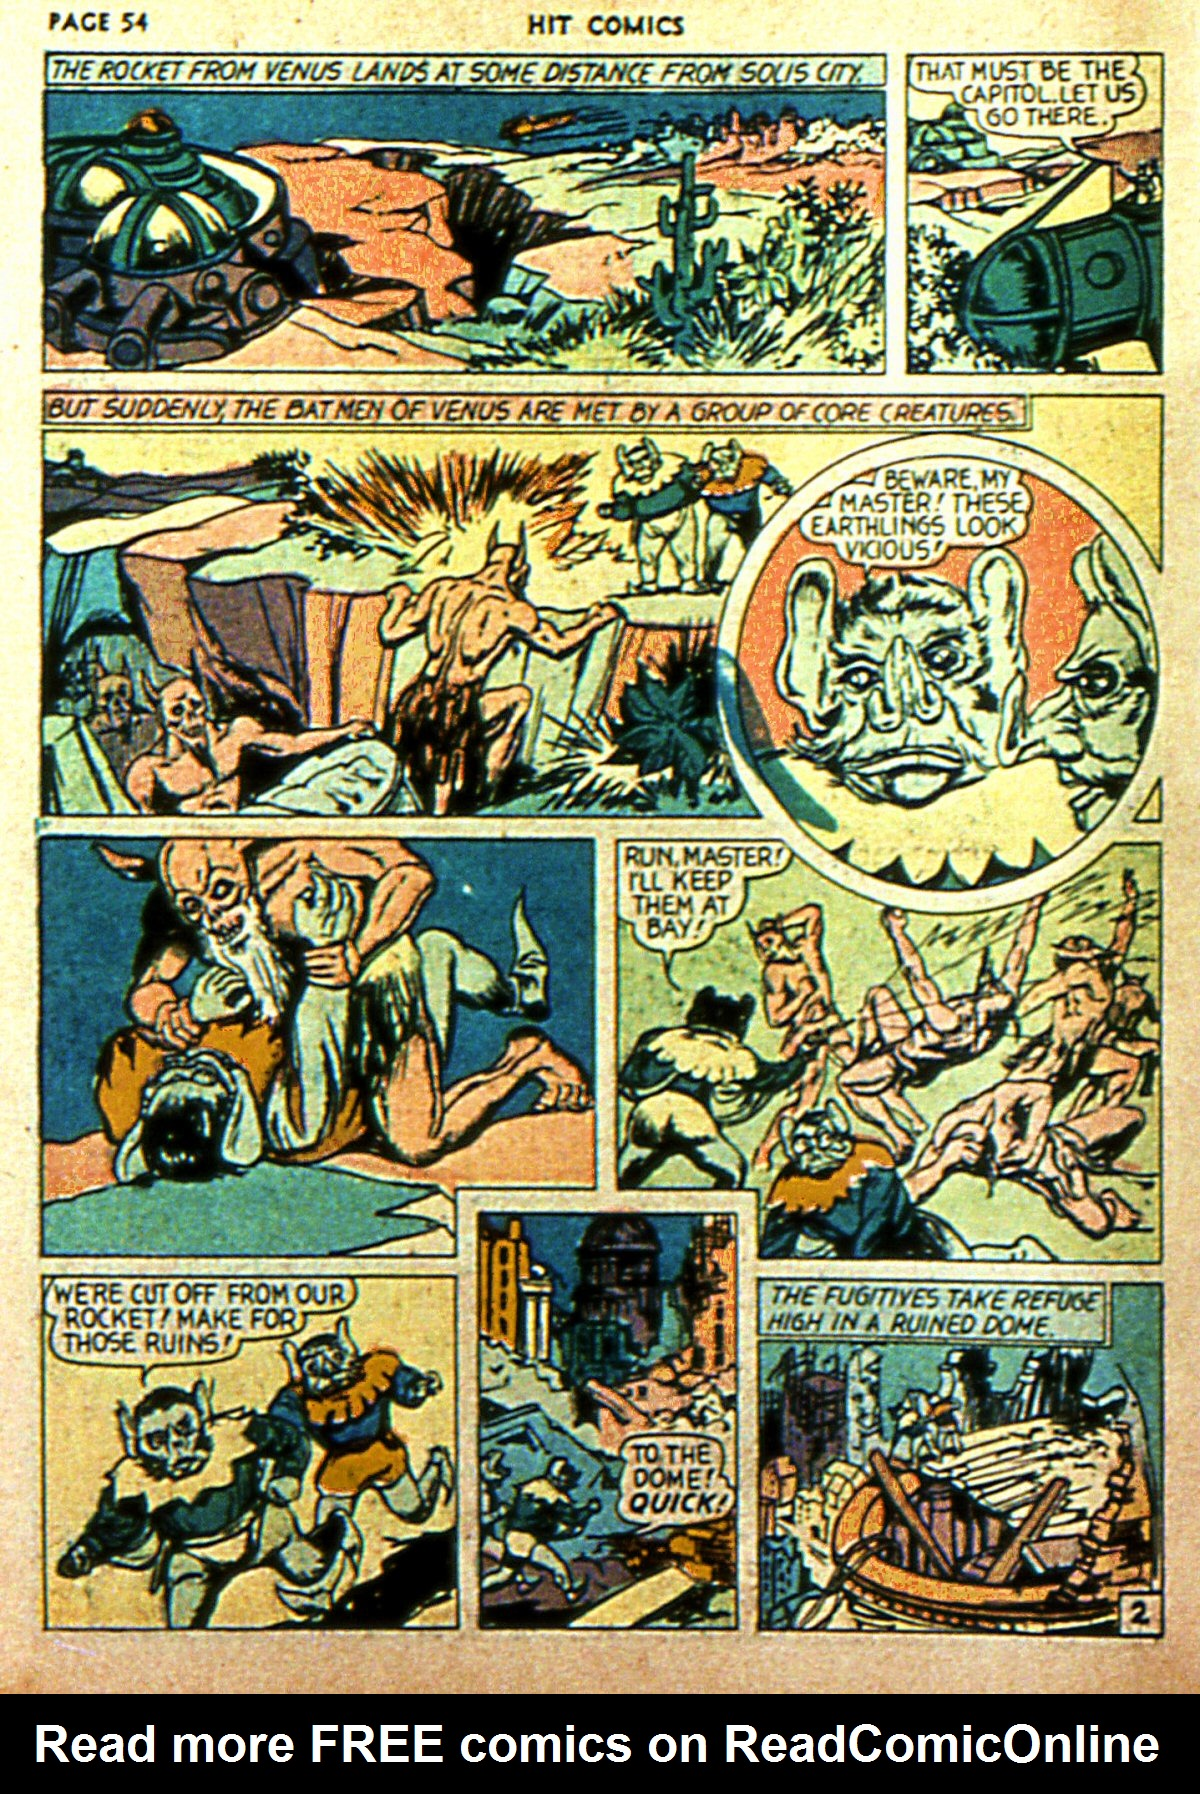 Read online Hit Comics comic -  Issue #2 - 56